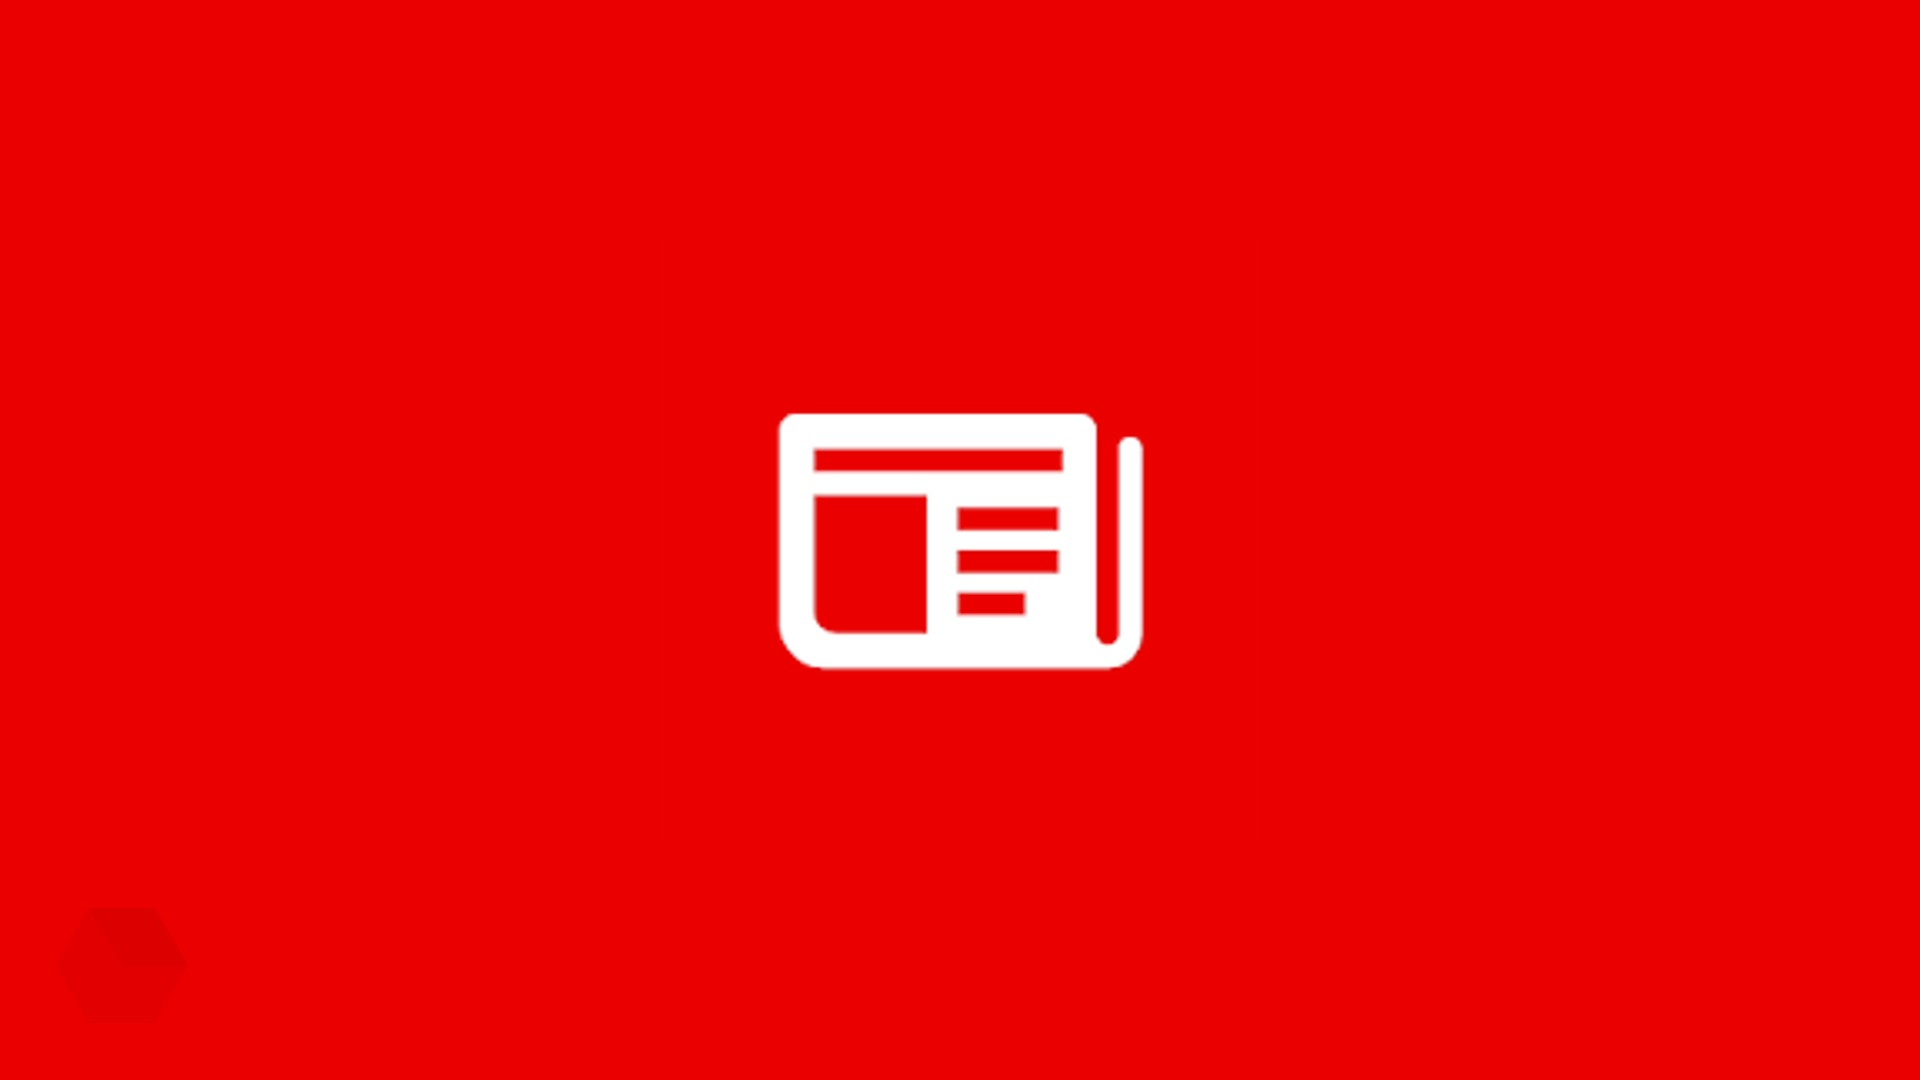 Microsoft News επιλογή δημοσιεύσεων με AI